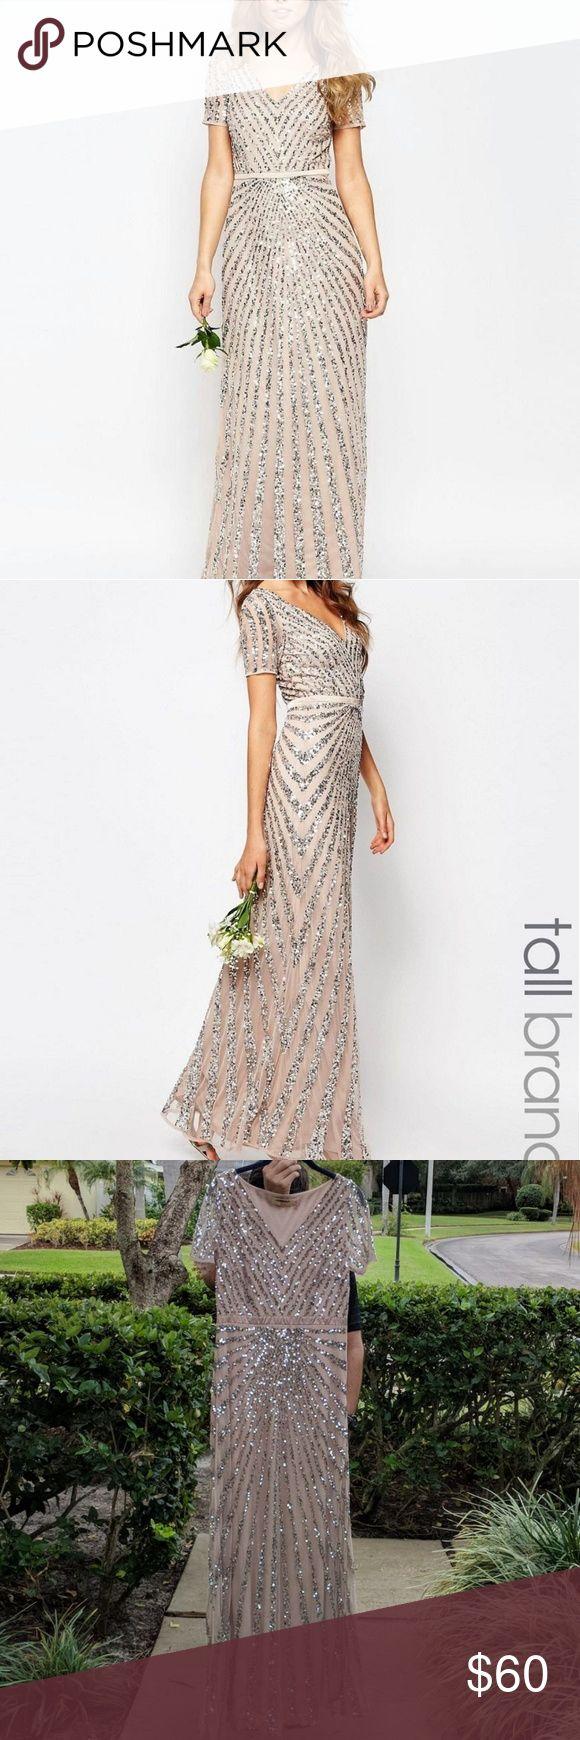 ASOS Maya Sequin bridesmaid dress Blush / pink / Sparkly / sequin Wedding /bridesmaid / gown ASOS Dresses Maxi